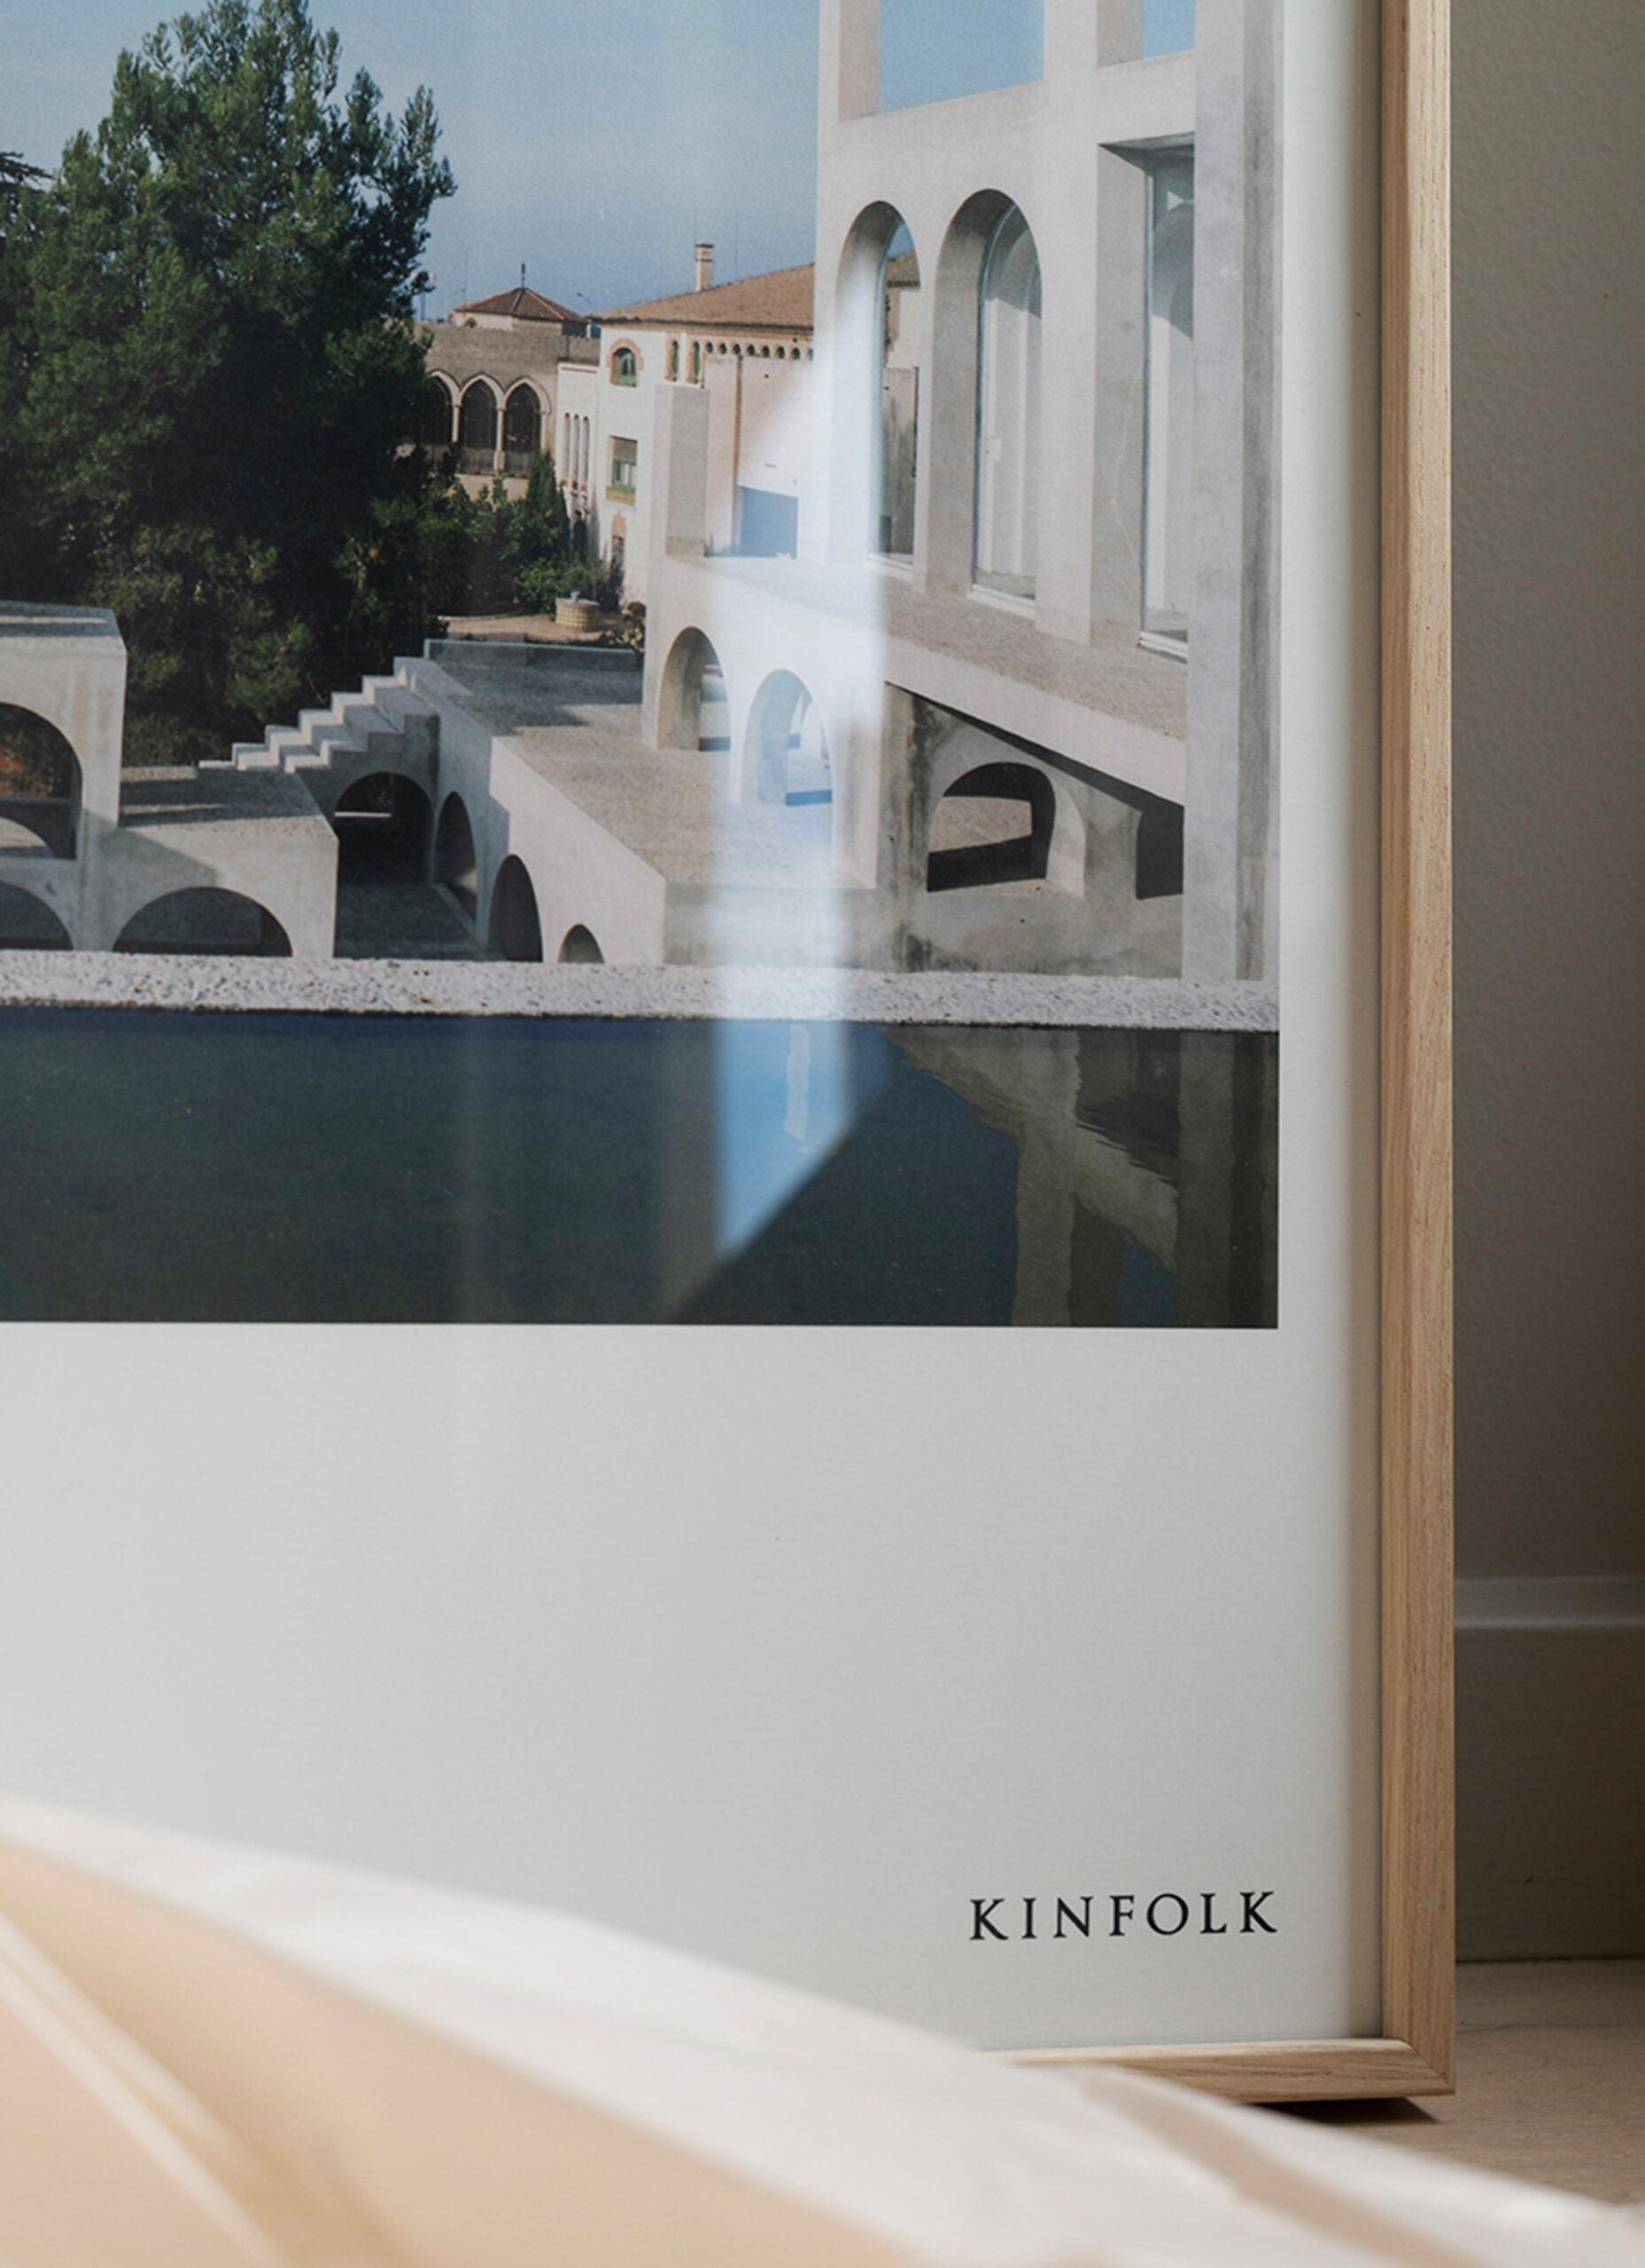 Alium Special Edition for Kinfolk - Art Print - Salva Lopez - Xavier Corbero - 02 - 40x50cm